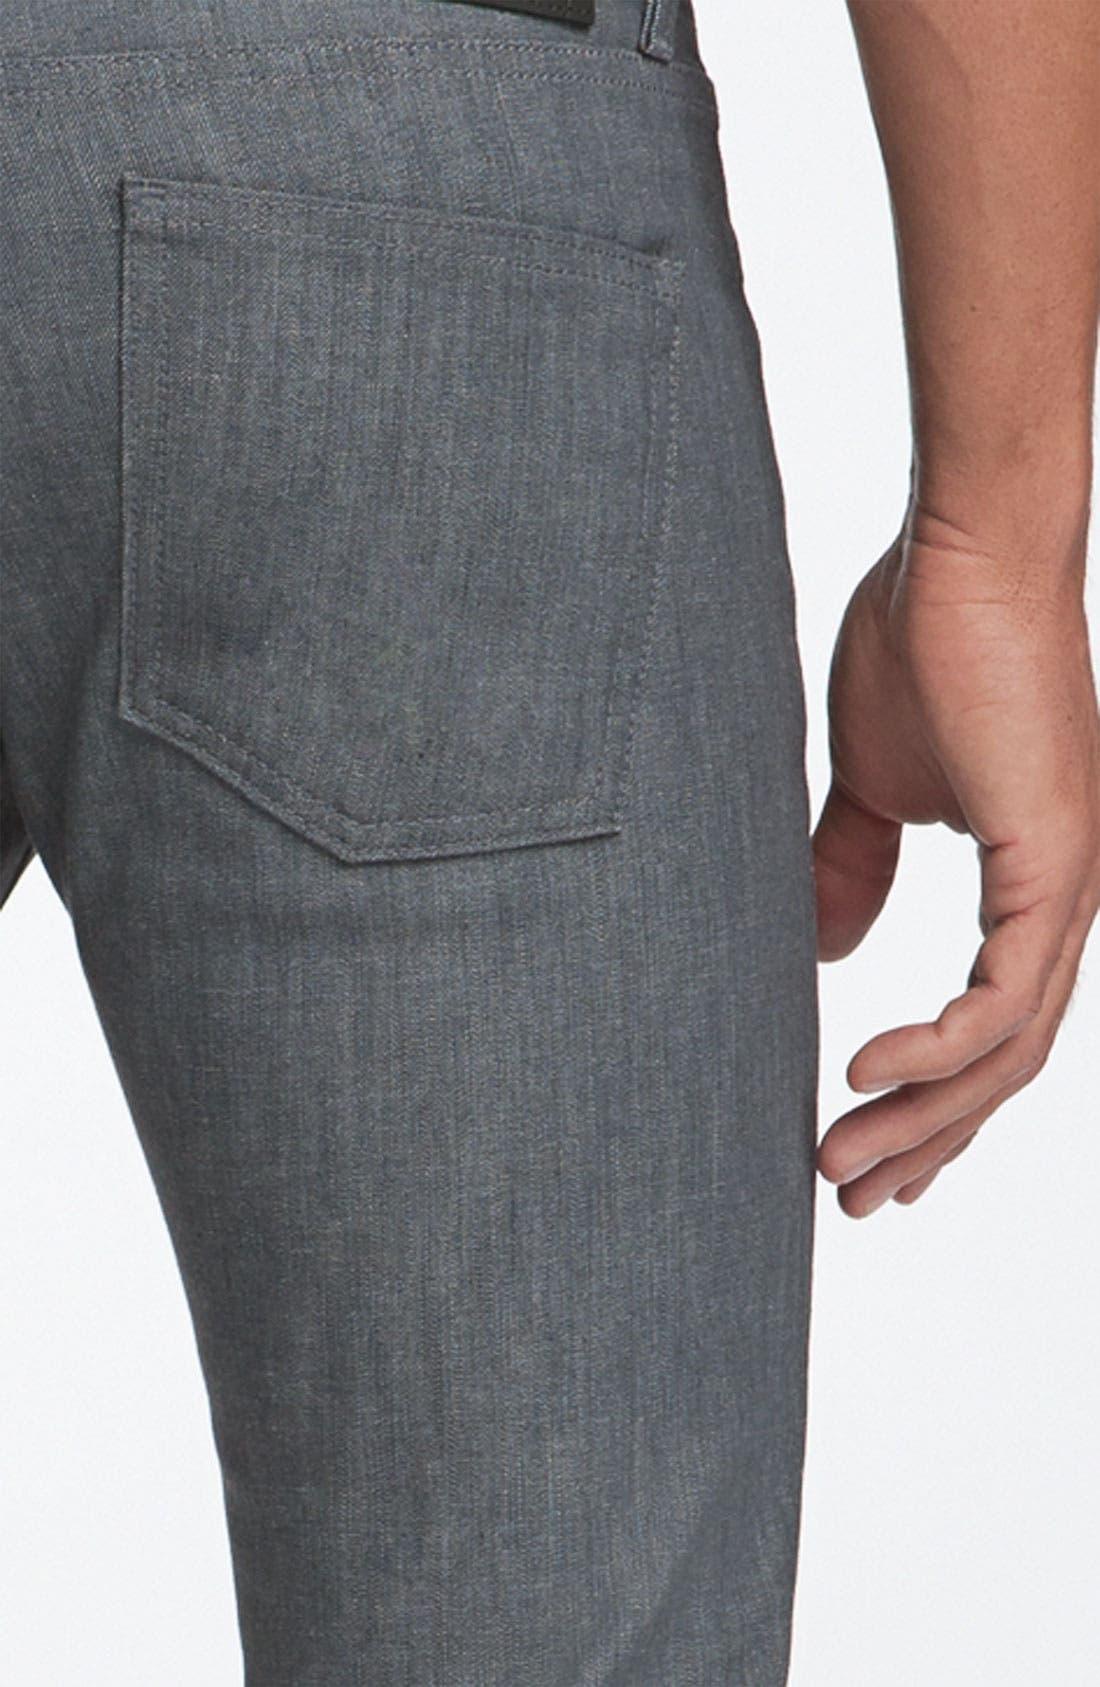 NAKED & FAMOUS DENIM,                             'Skinny Guy' Skinny Fit Jeans,                             Alternate thumbnail 3, color,                             060